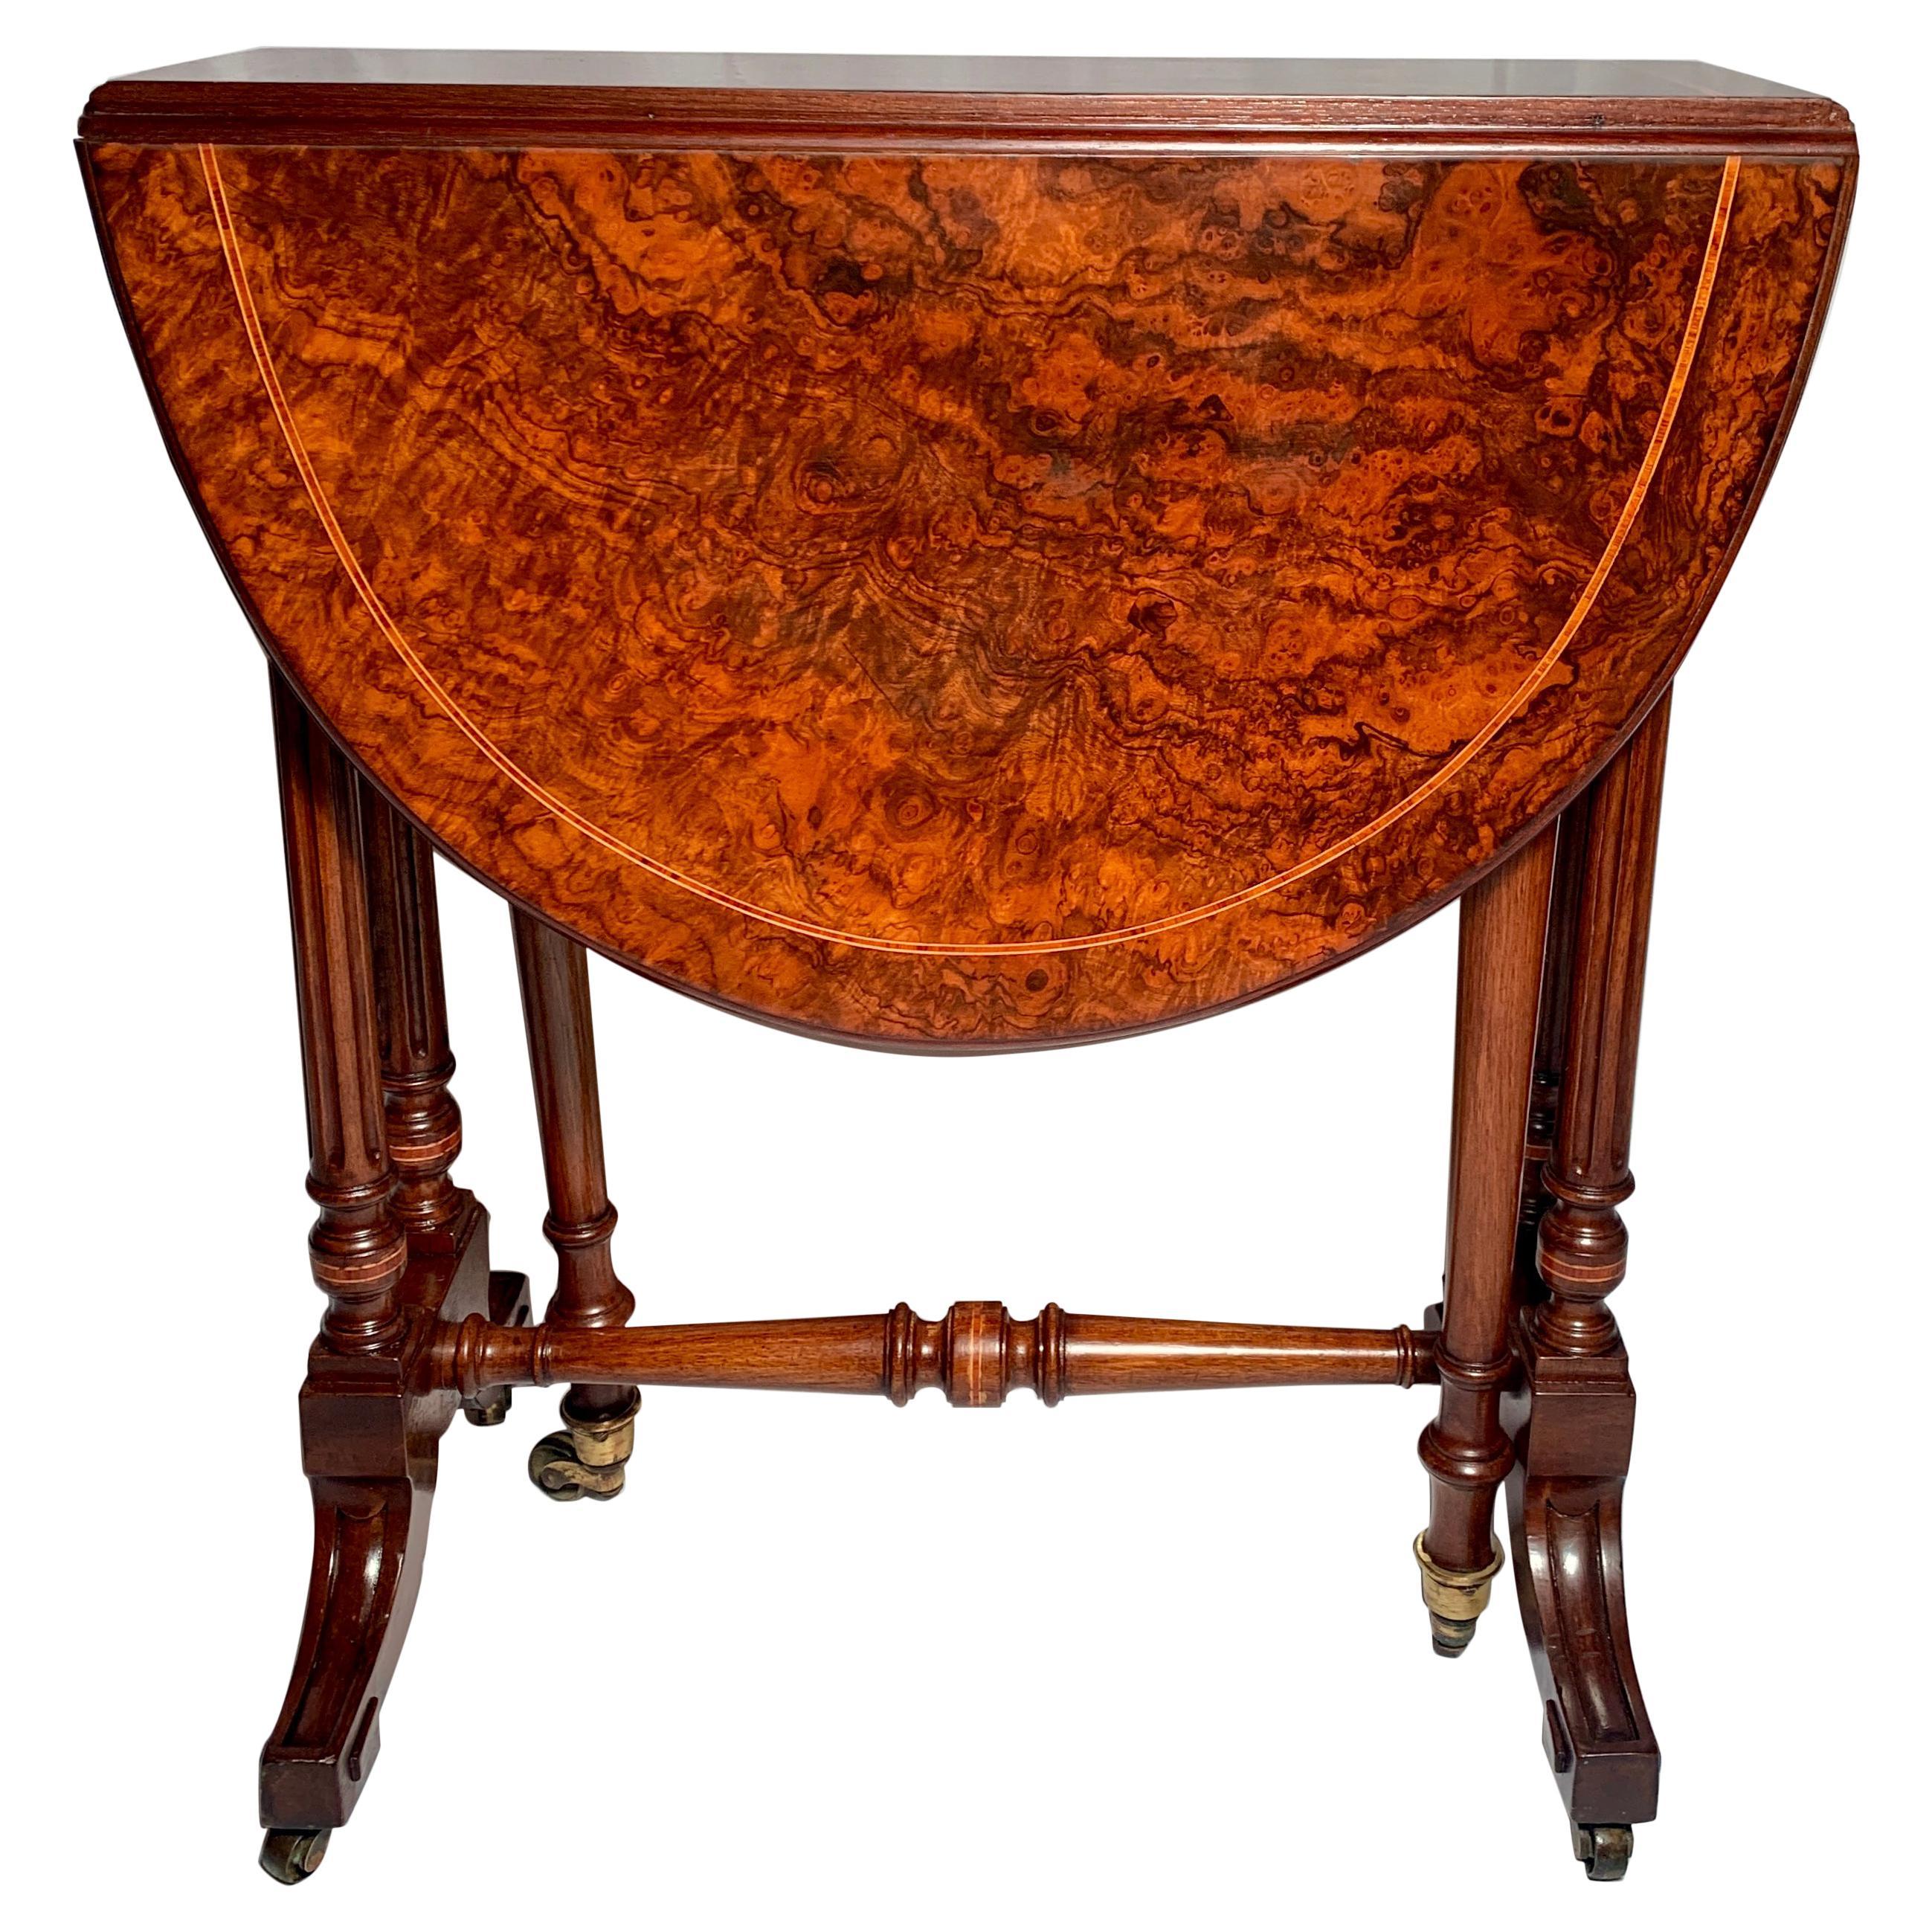 Antique English Burl Walnut Miniature Sutherland Table